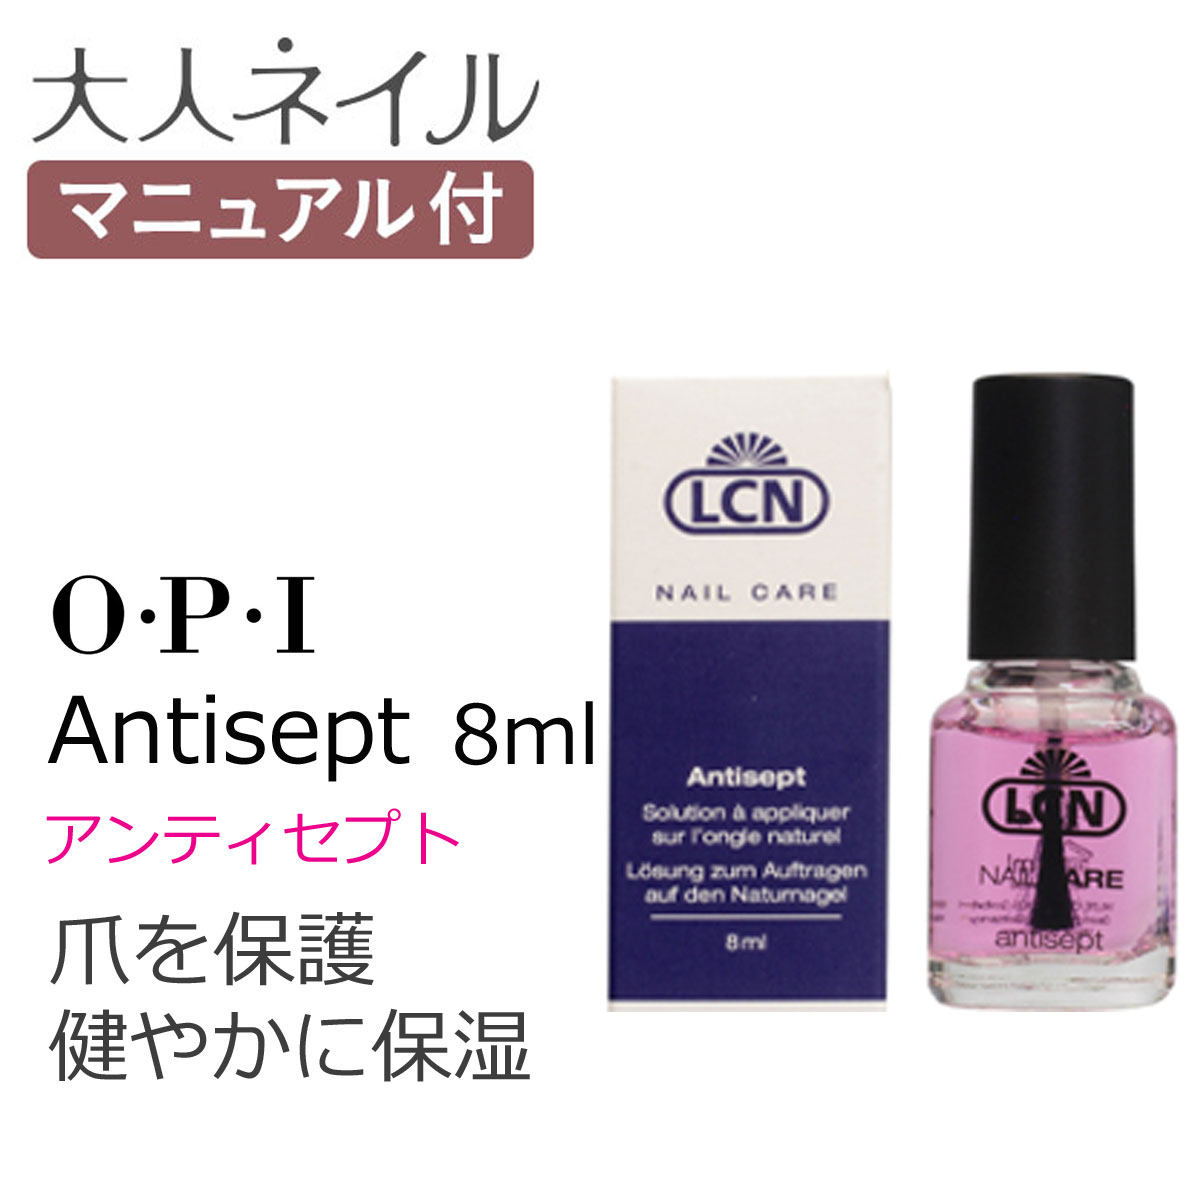 LCN アンティセプト8ml